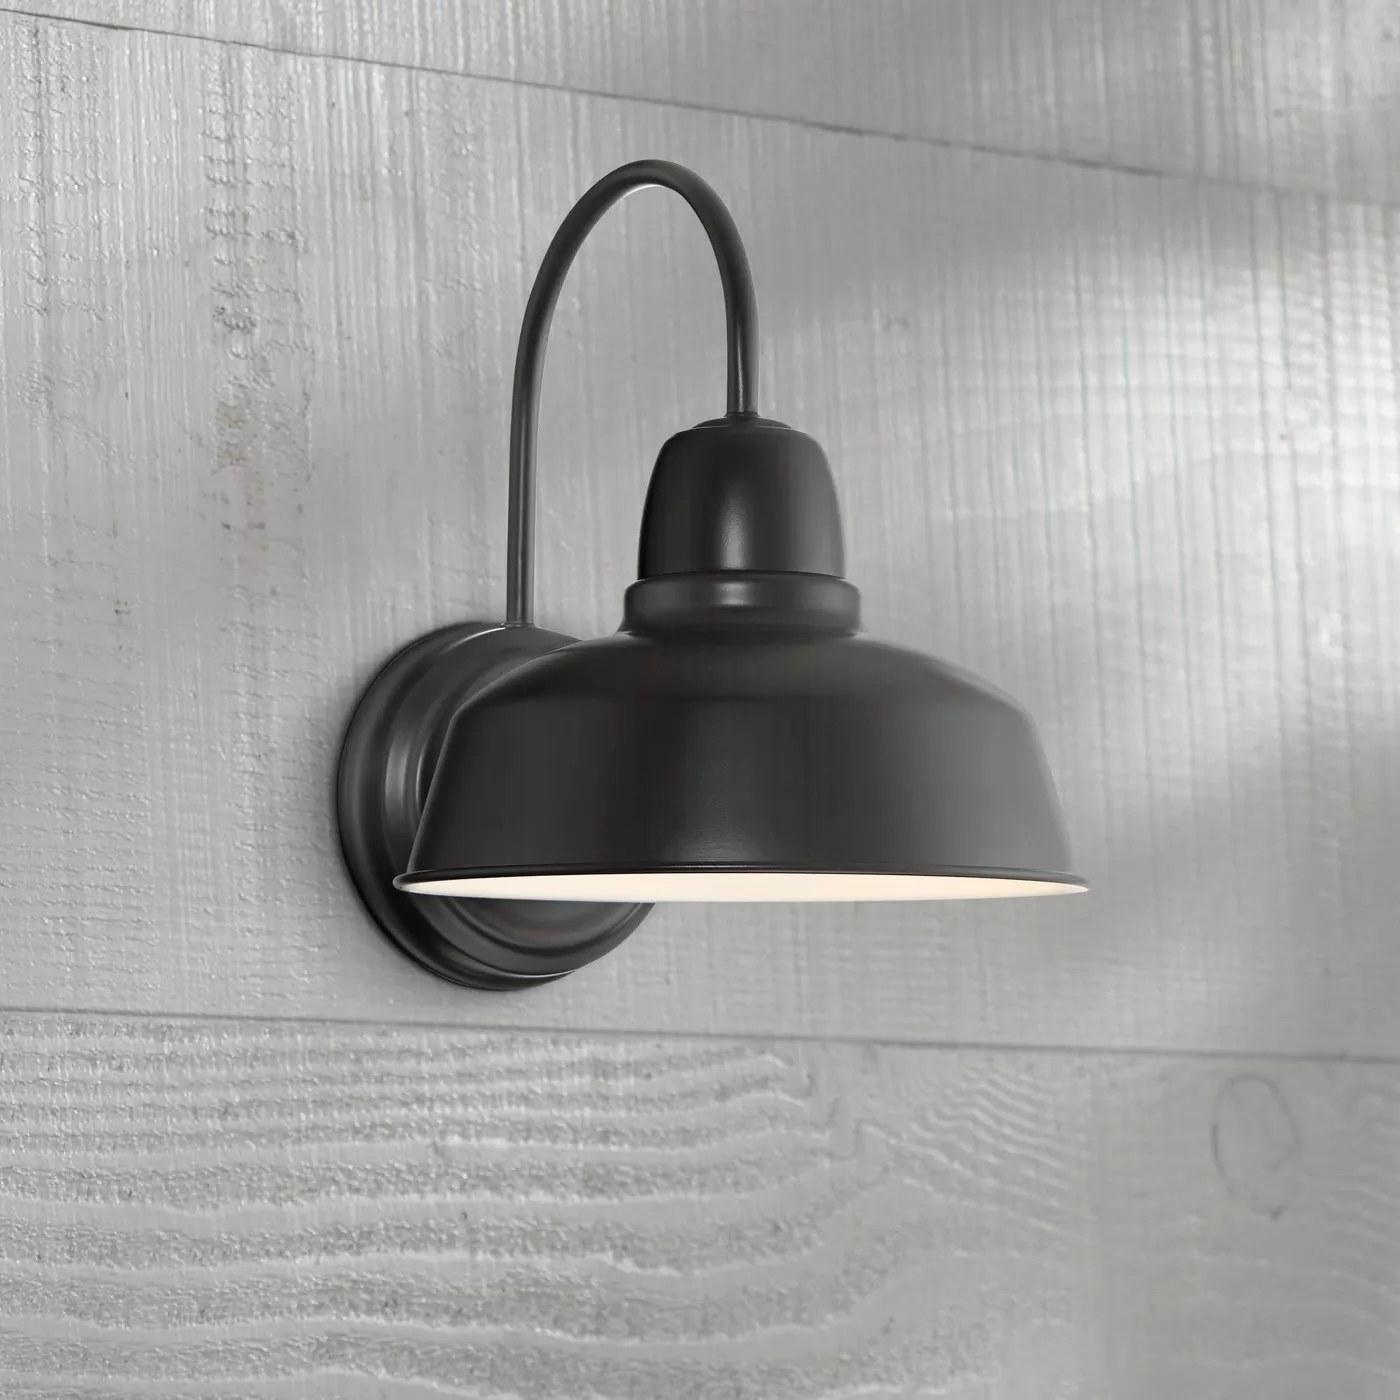 The black light fixture